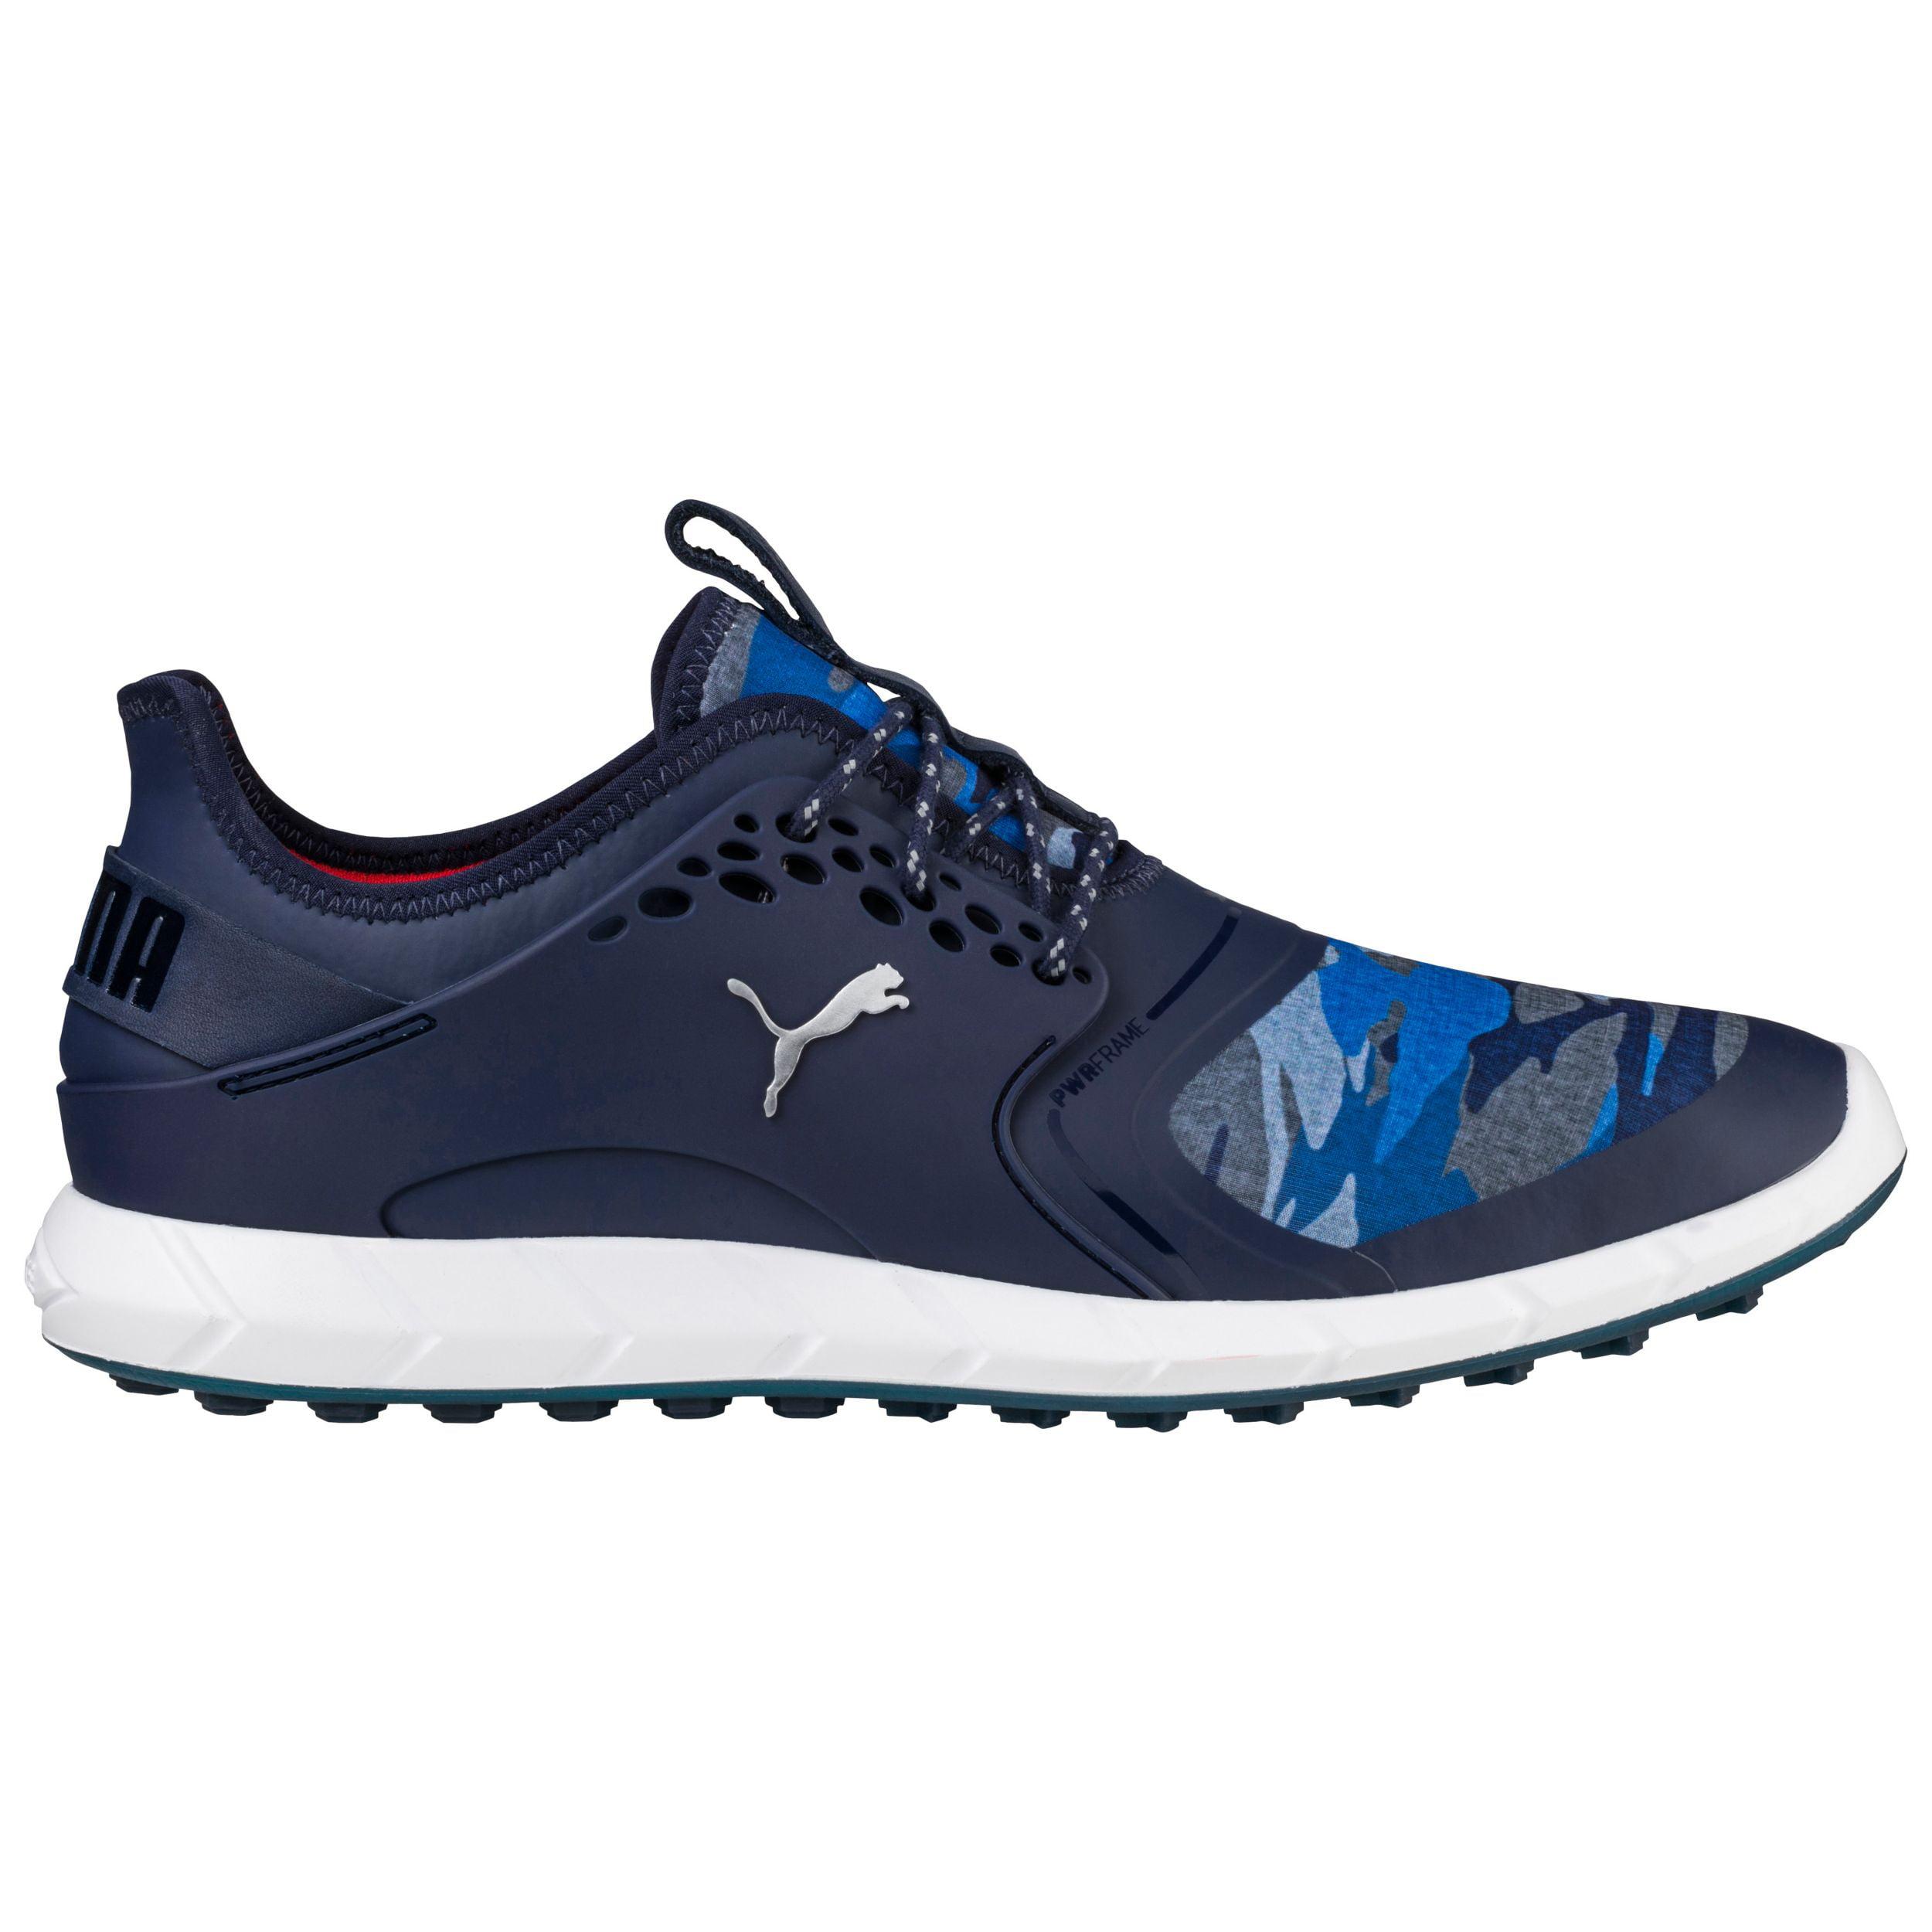 Puma Golf- Volition Ignite PWRSPORT Camo Shoes by Puma